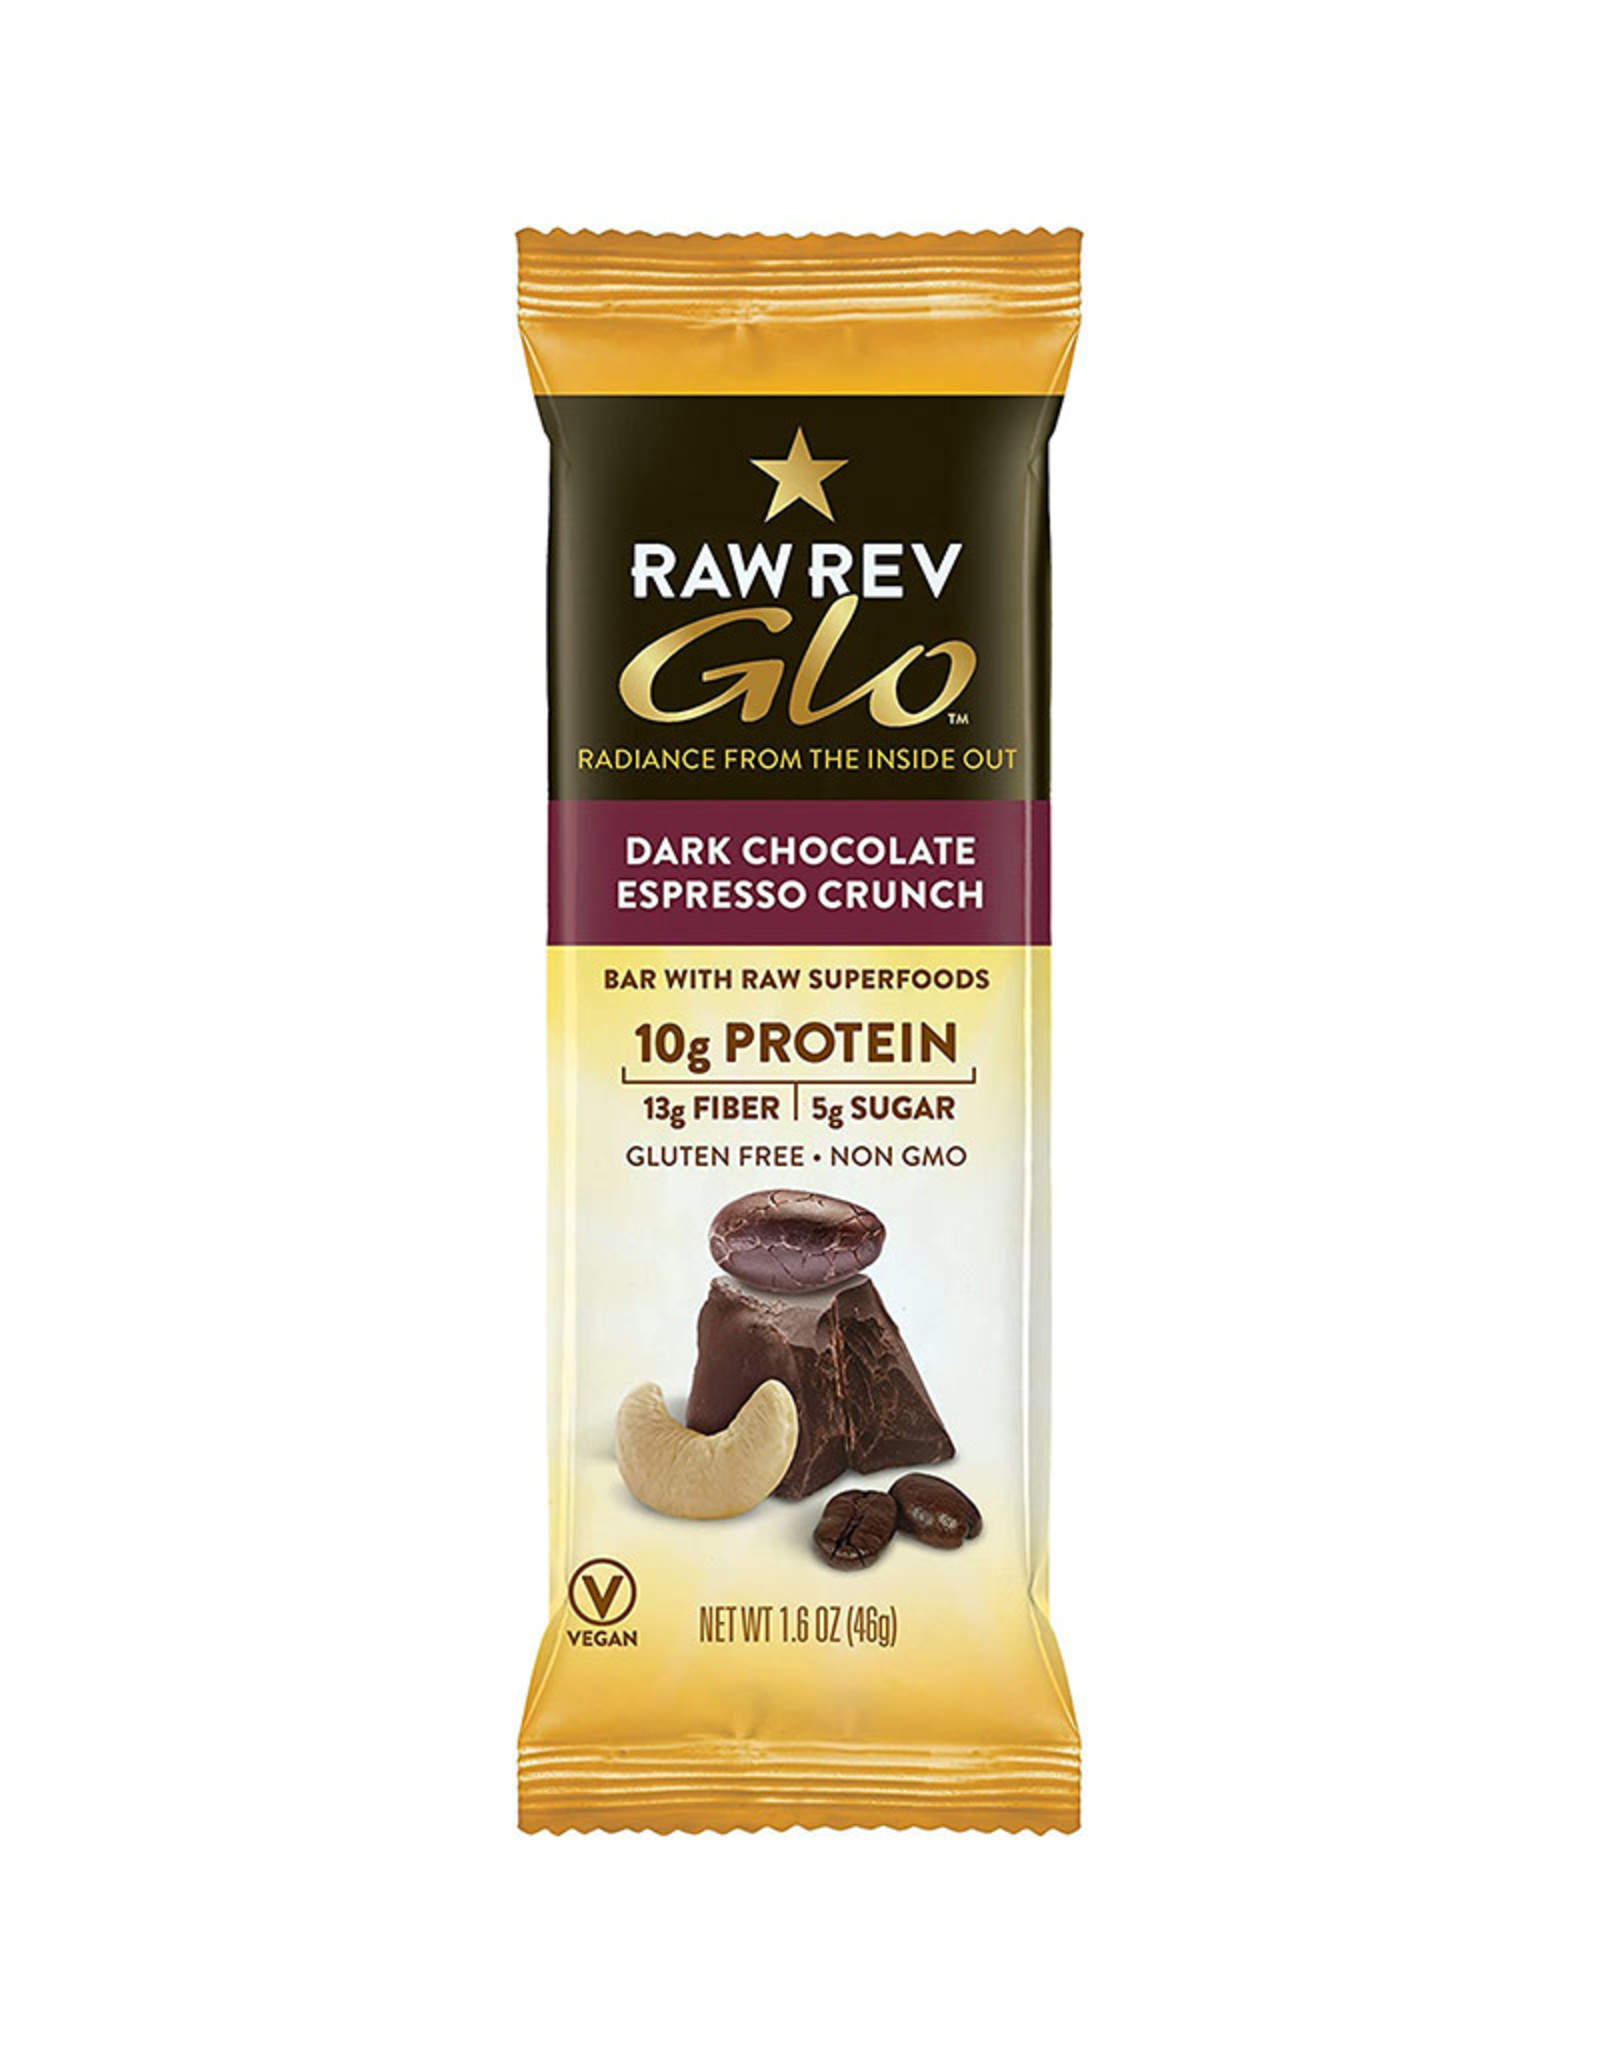 RAW Revolution Raw Revolution - Glo, Dark Chocolate Espresso Crunch